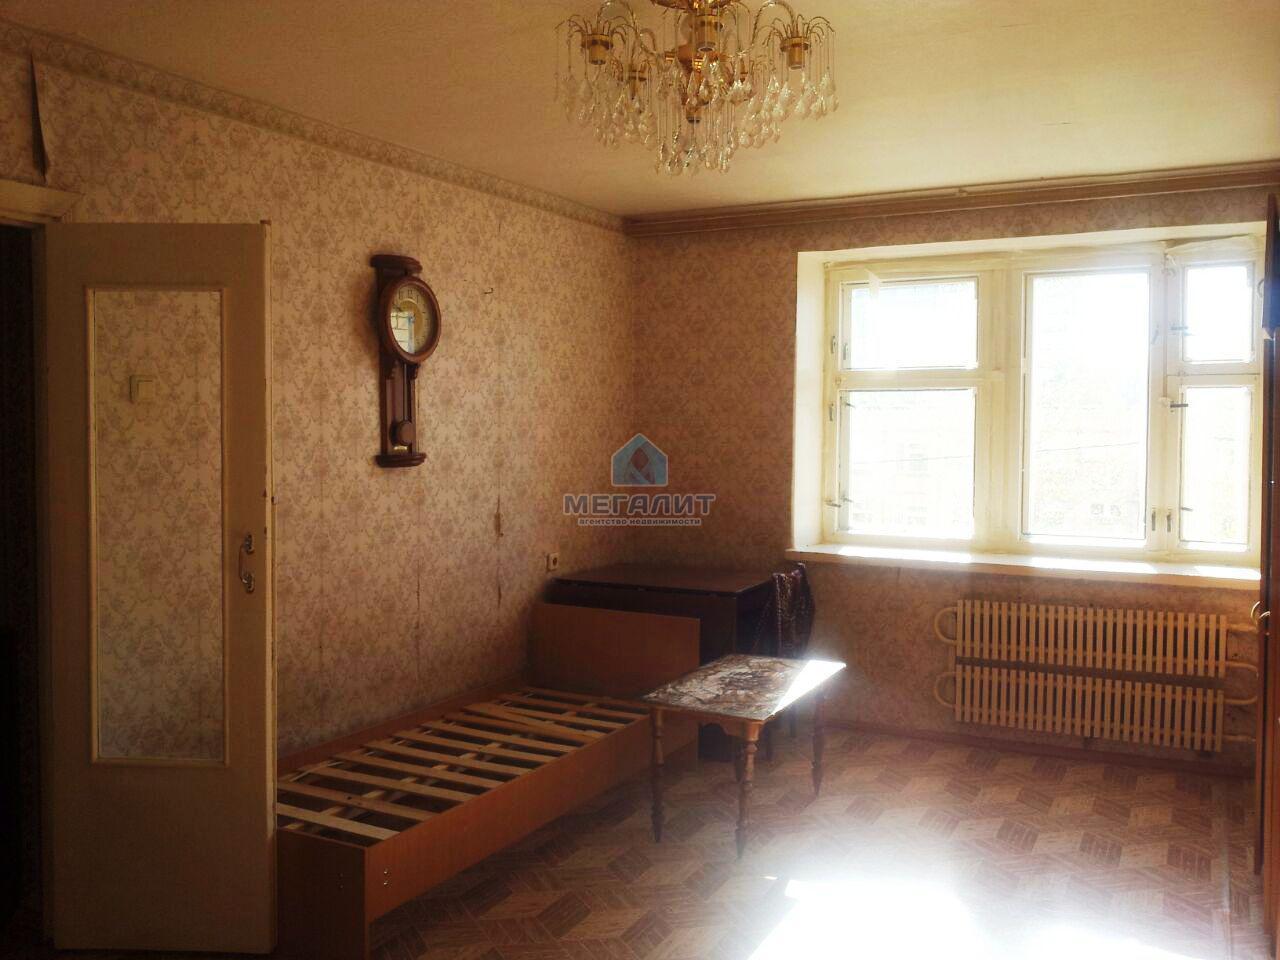 Двухкомнатная квартира в Ново-Савиновском районе! (миниатюра №3)